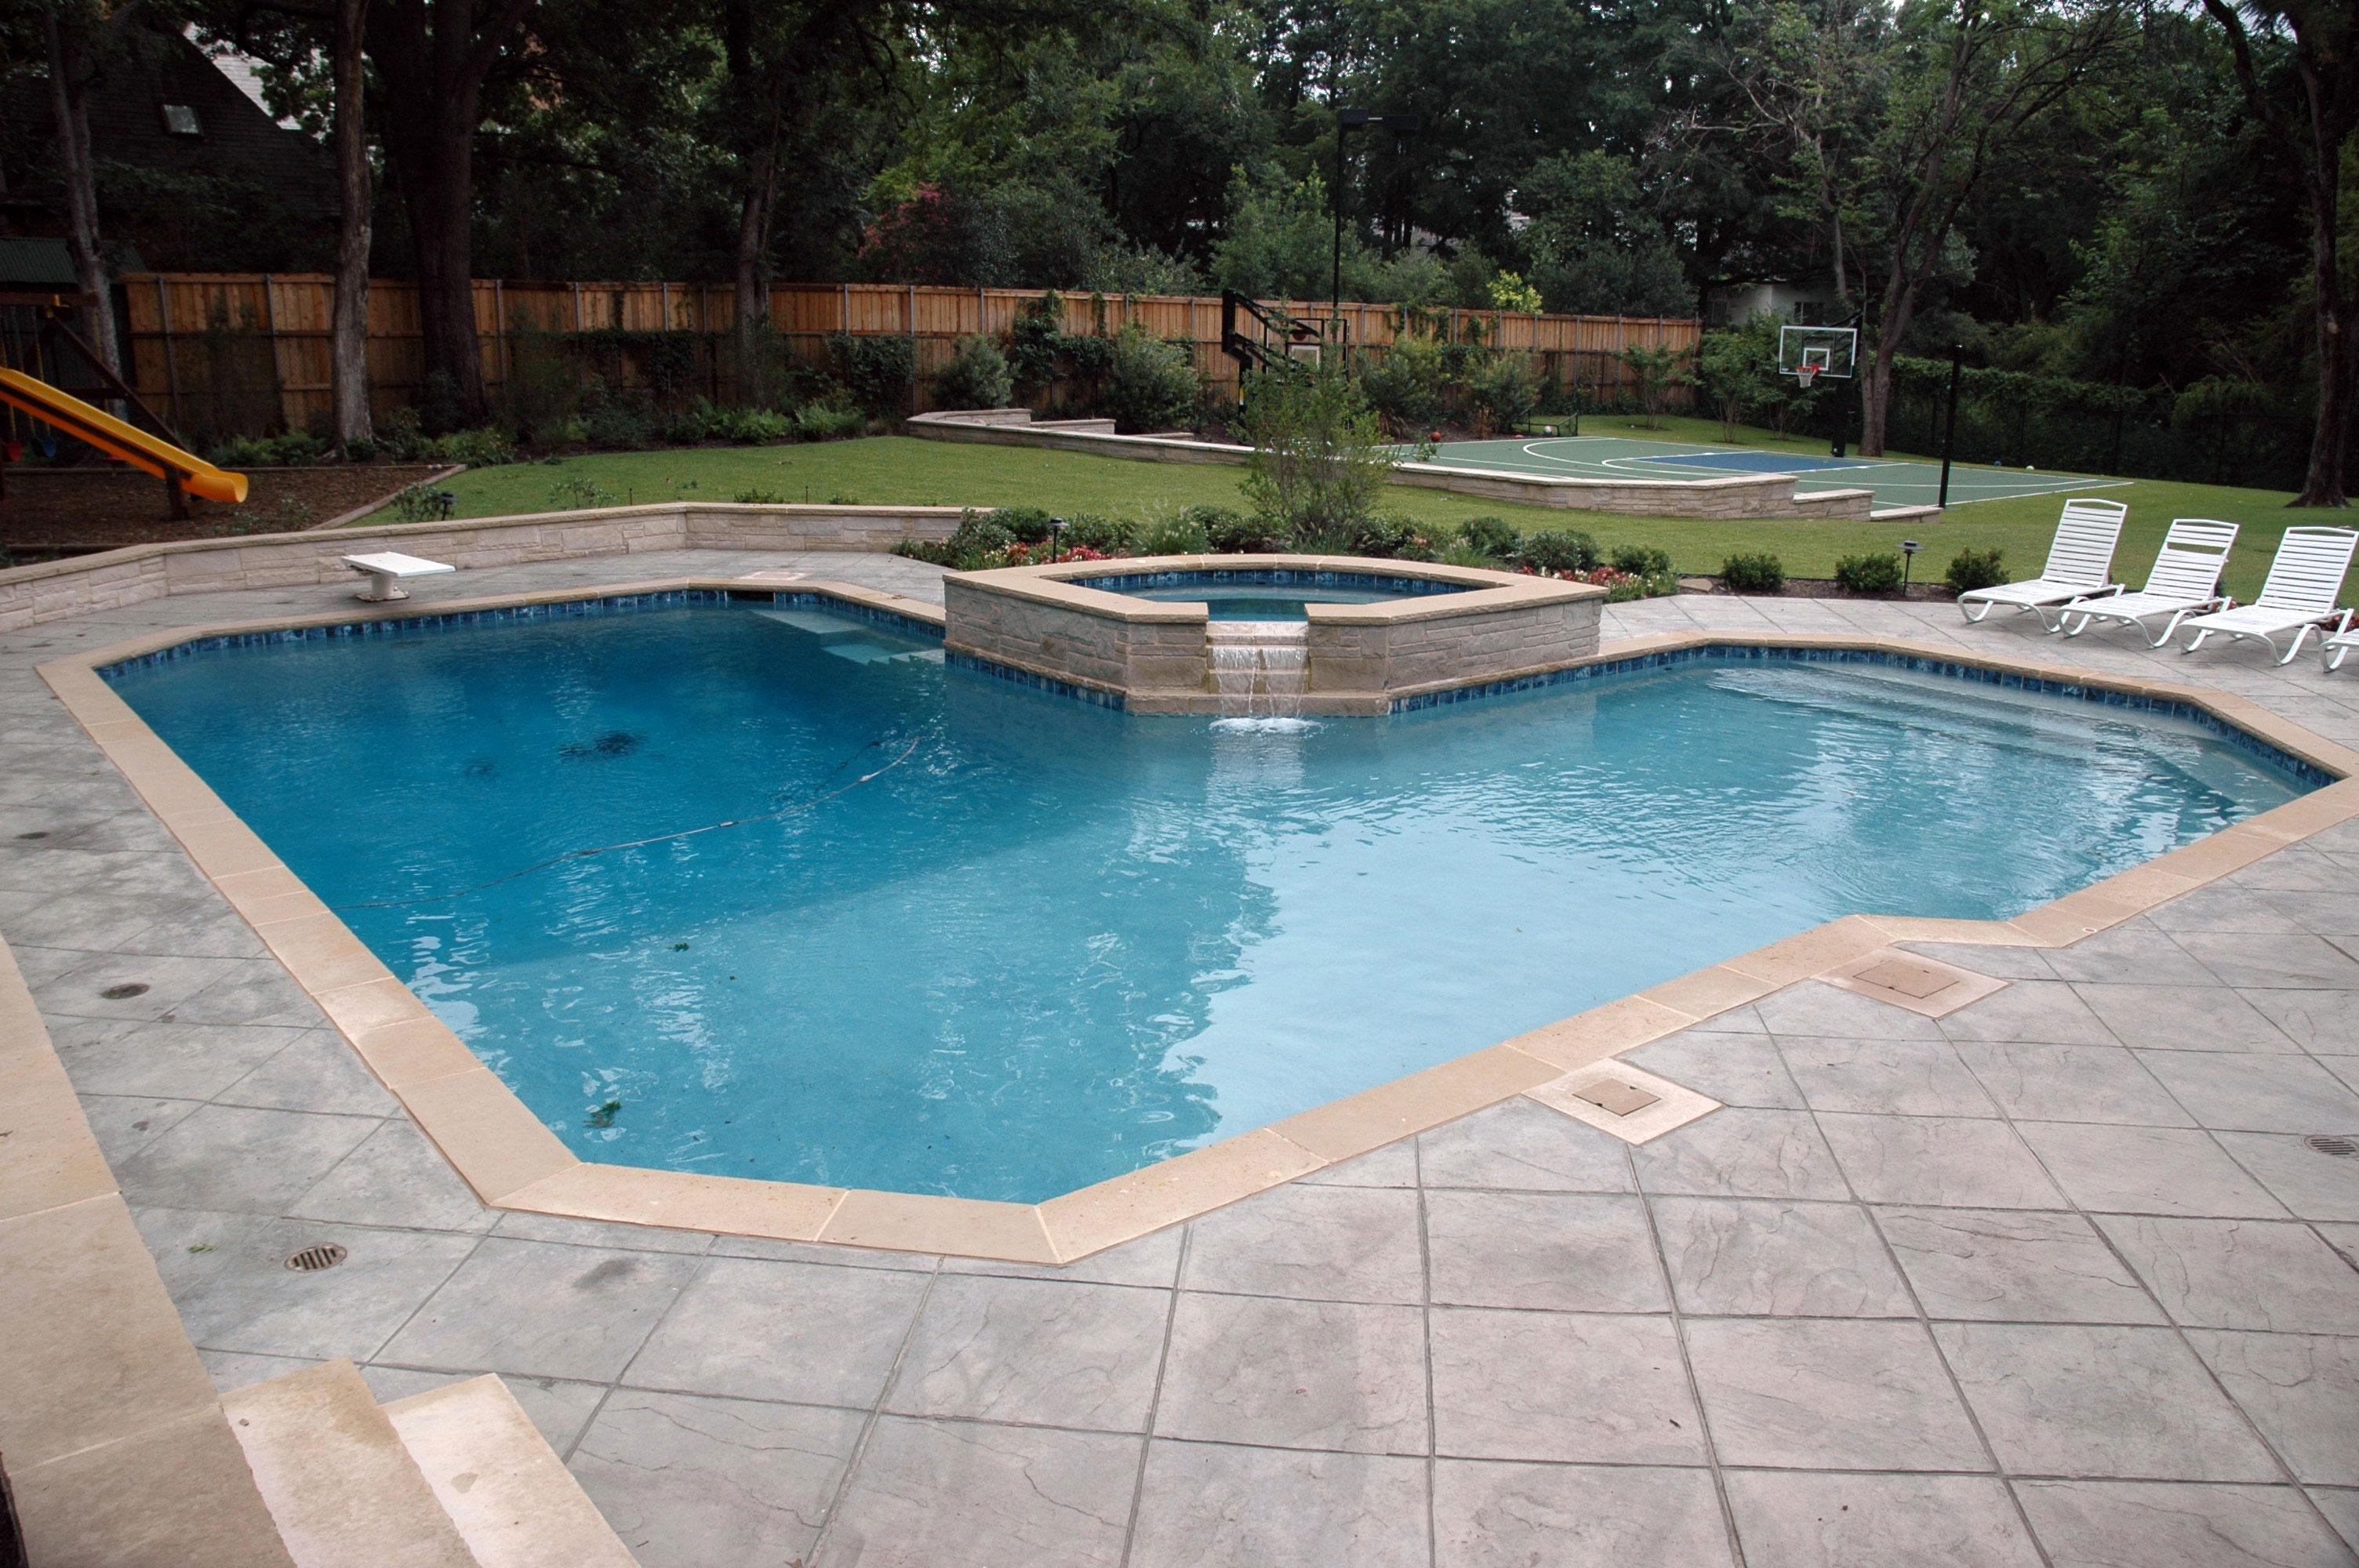 Pool 92